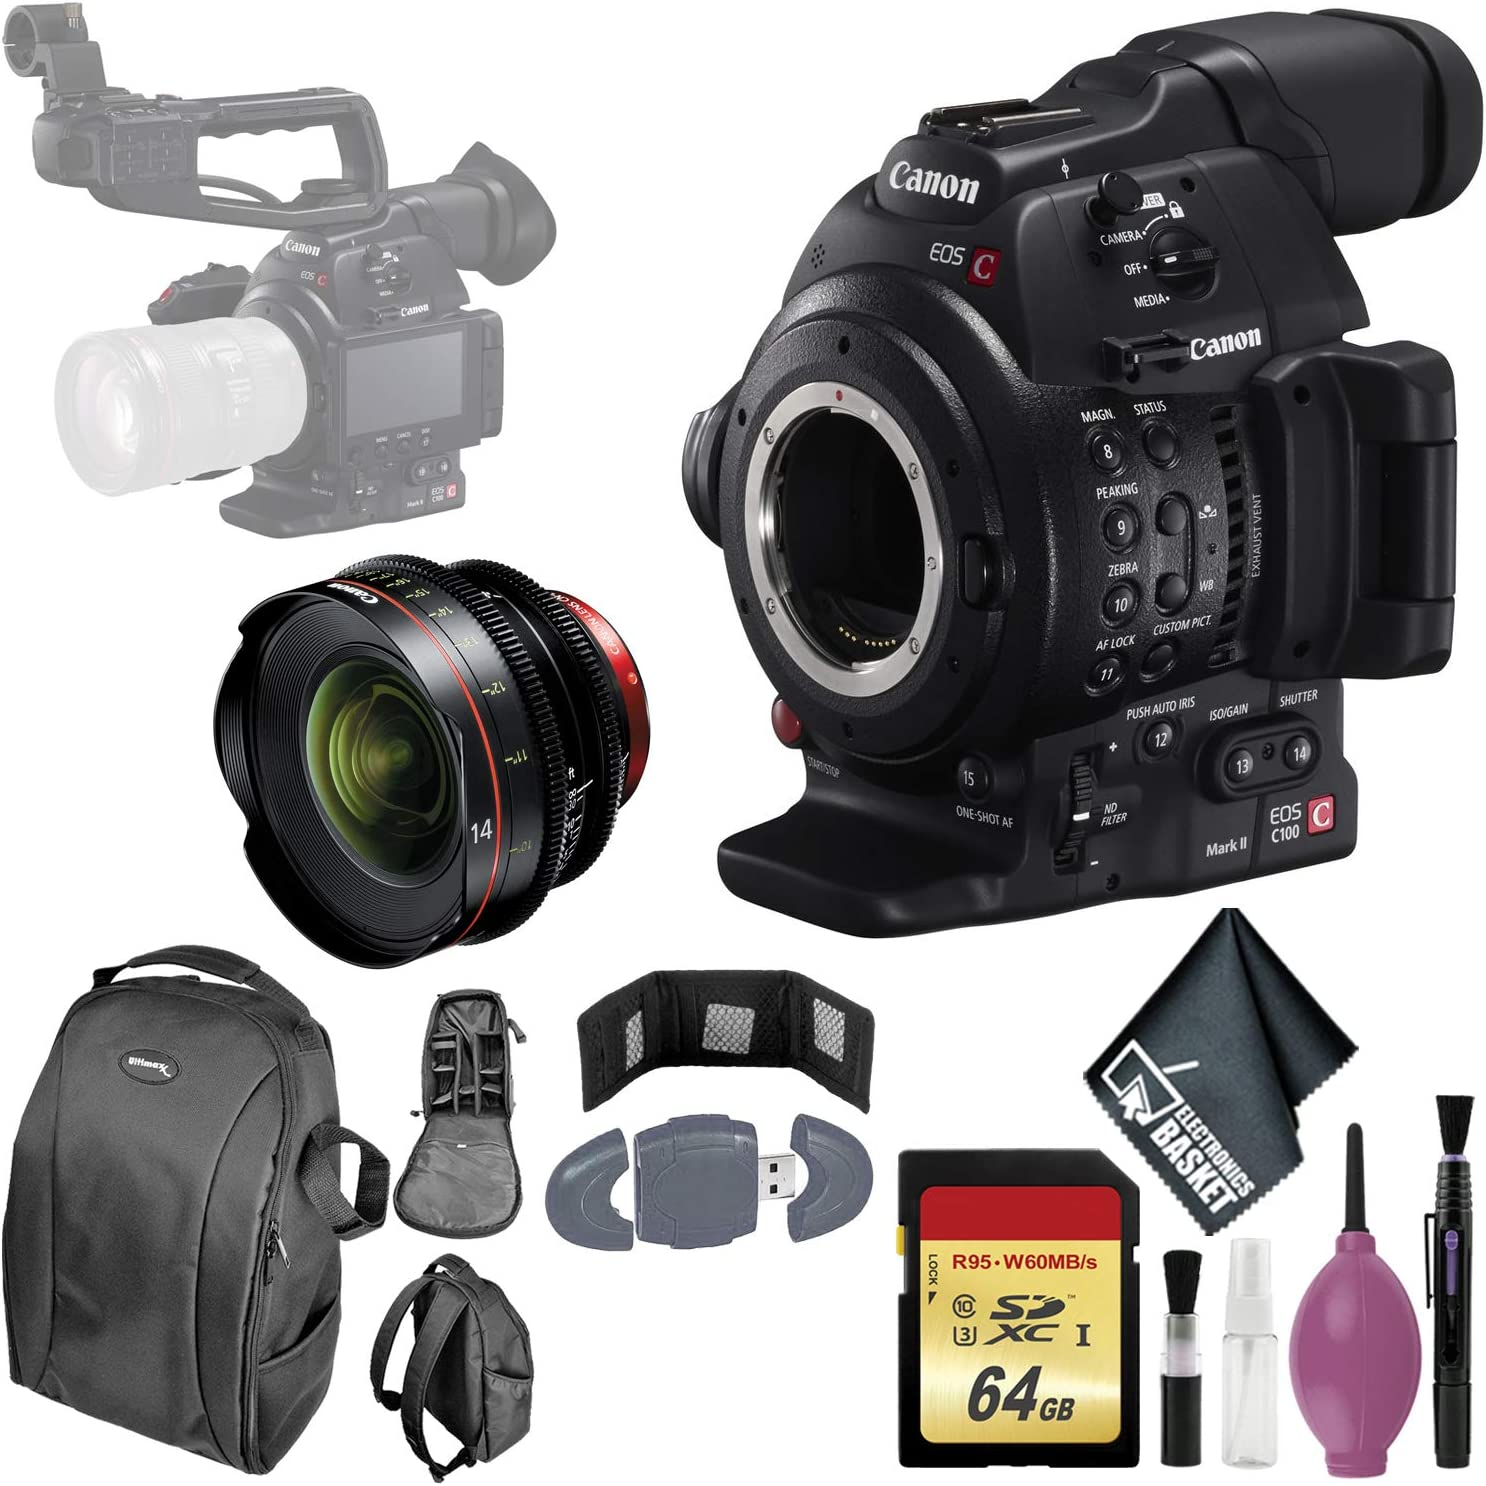 Canon EOS C100 Mark II Cinema Tulsa Mall CMOS Pixel Max 79% OFF AF with Dual Camera